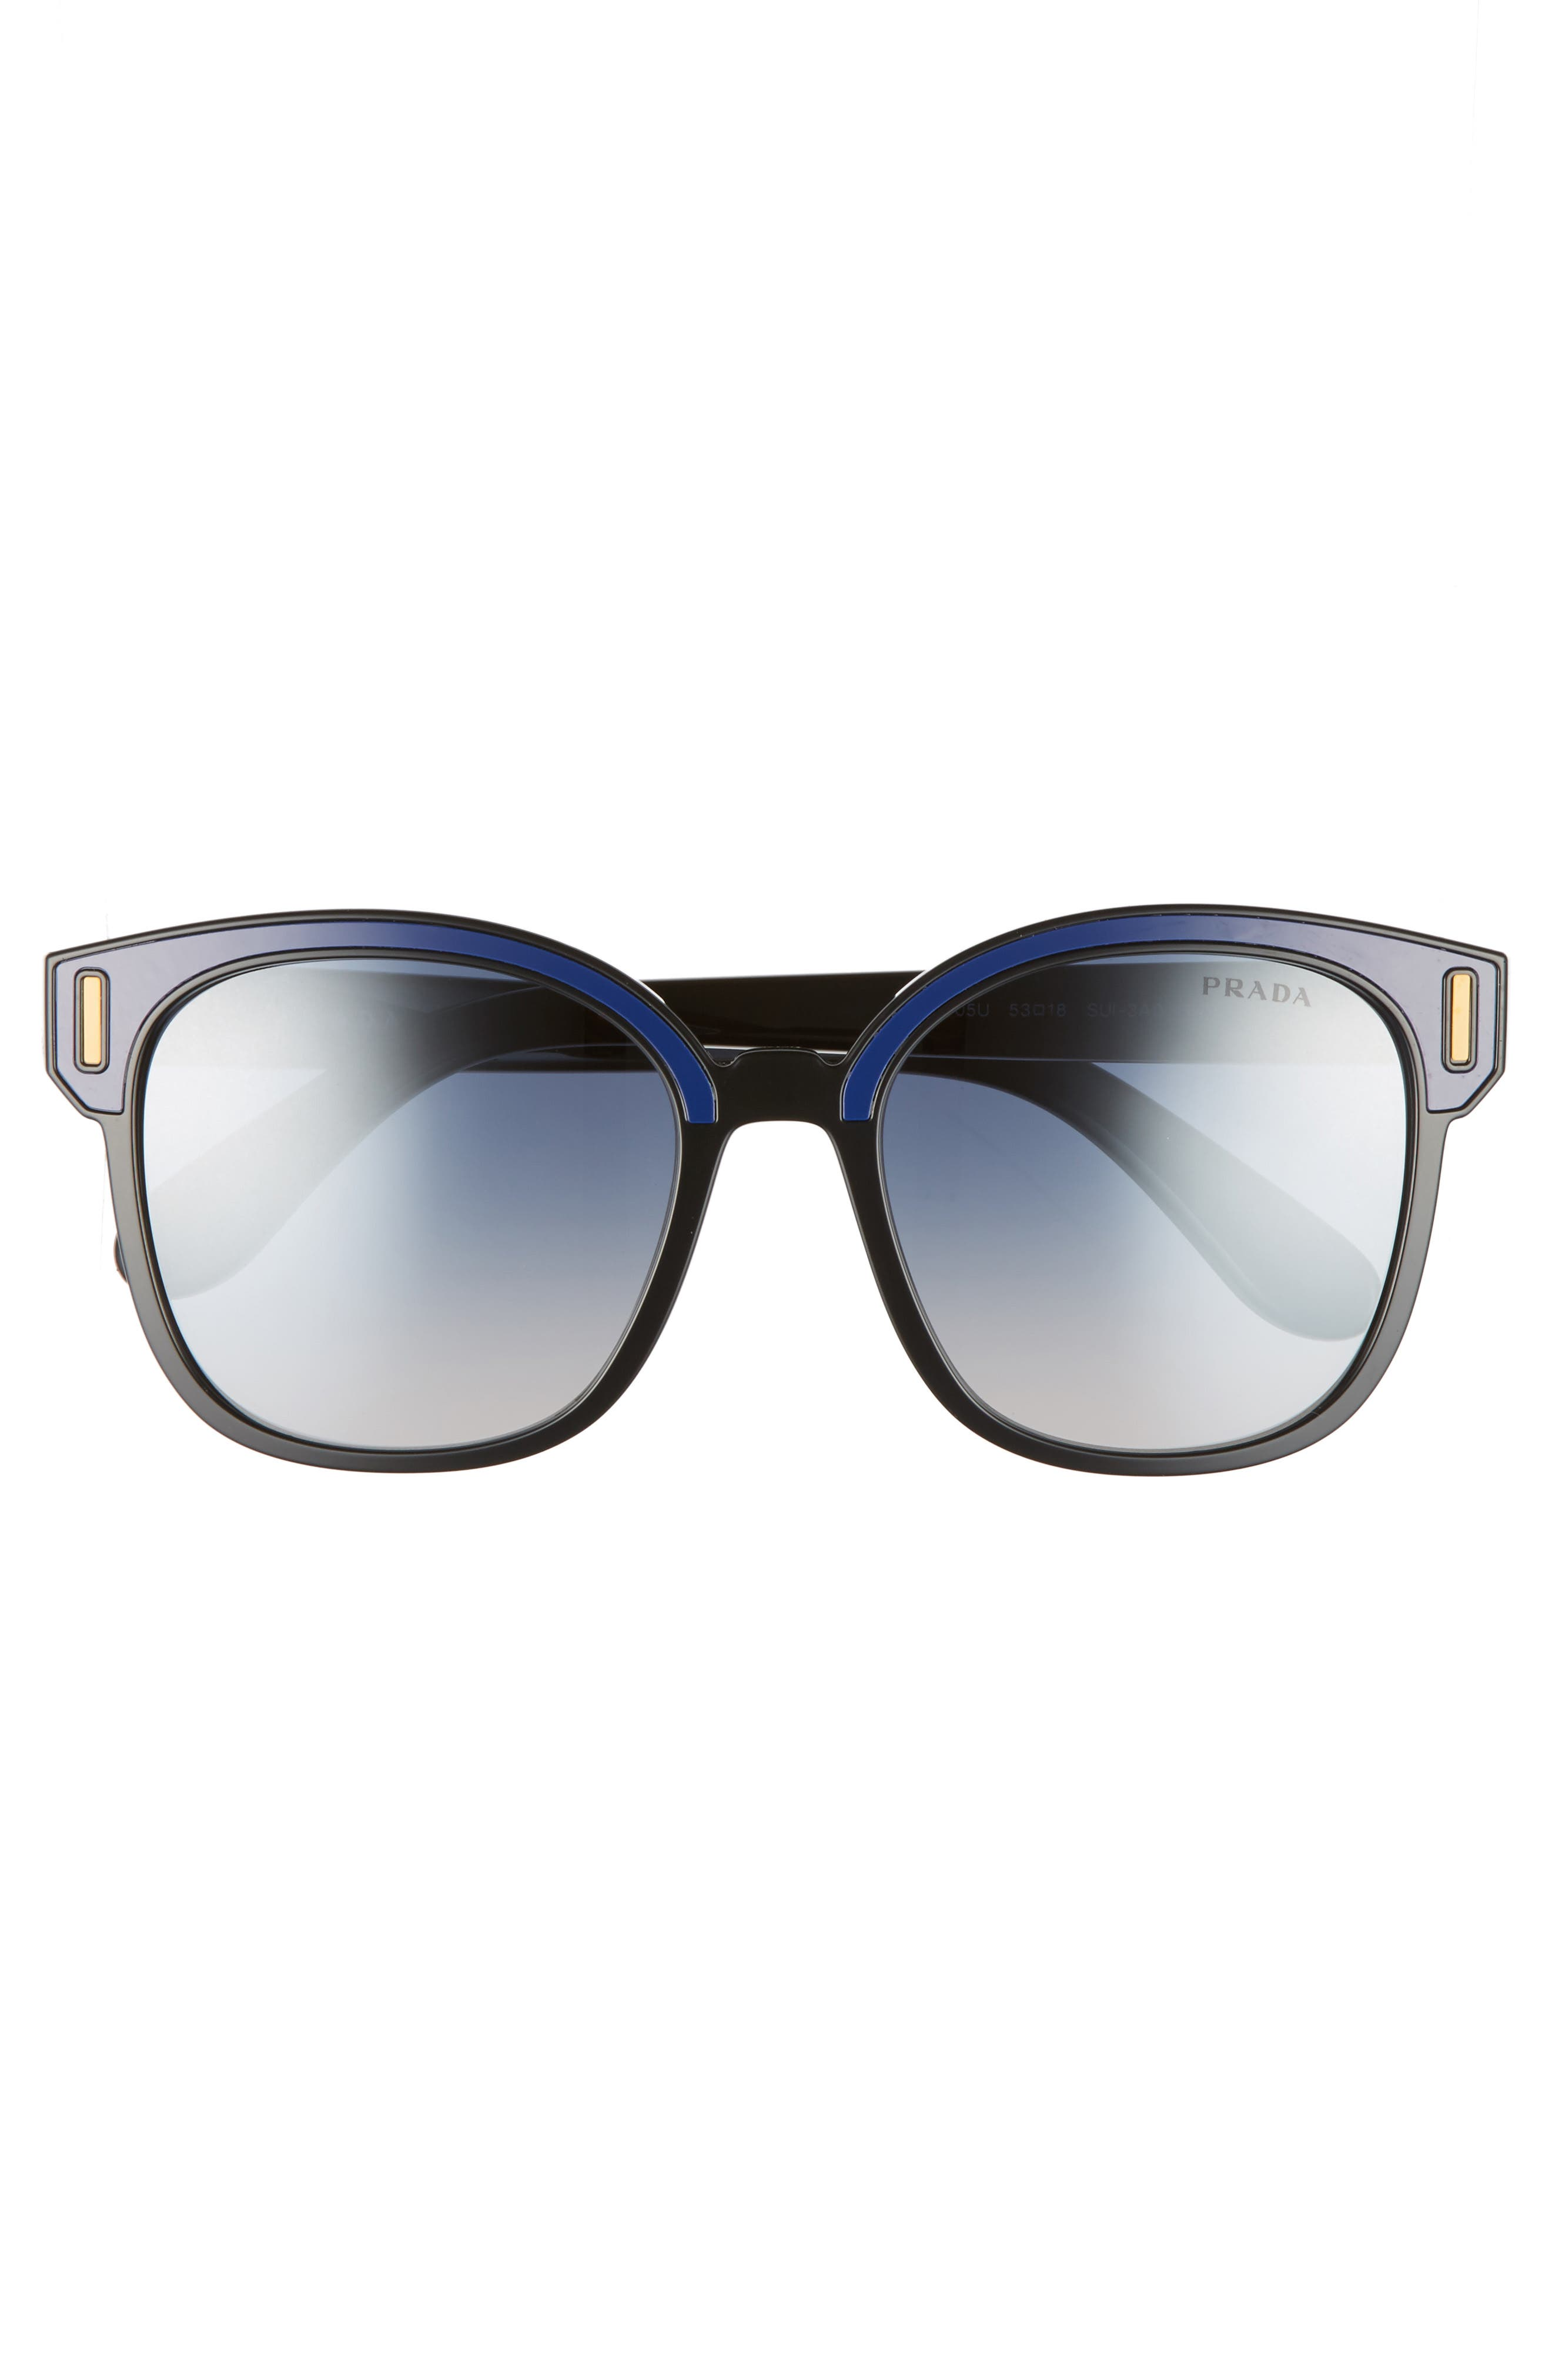 53mm Sunglasses,                             Alternate thumbnail 3, color,                             Black/ Blue